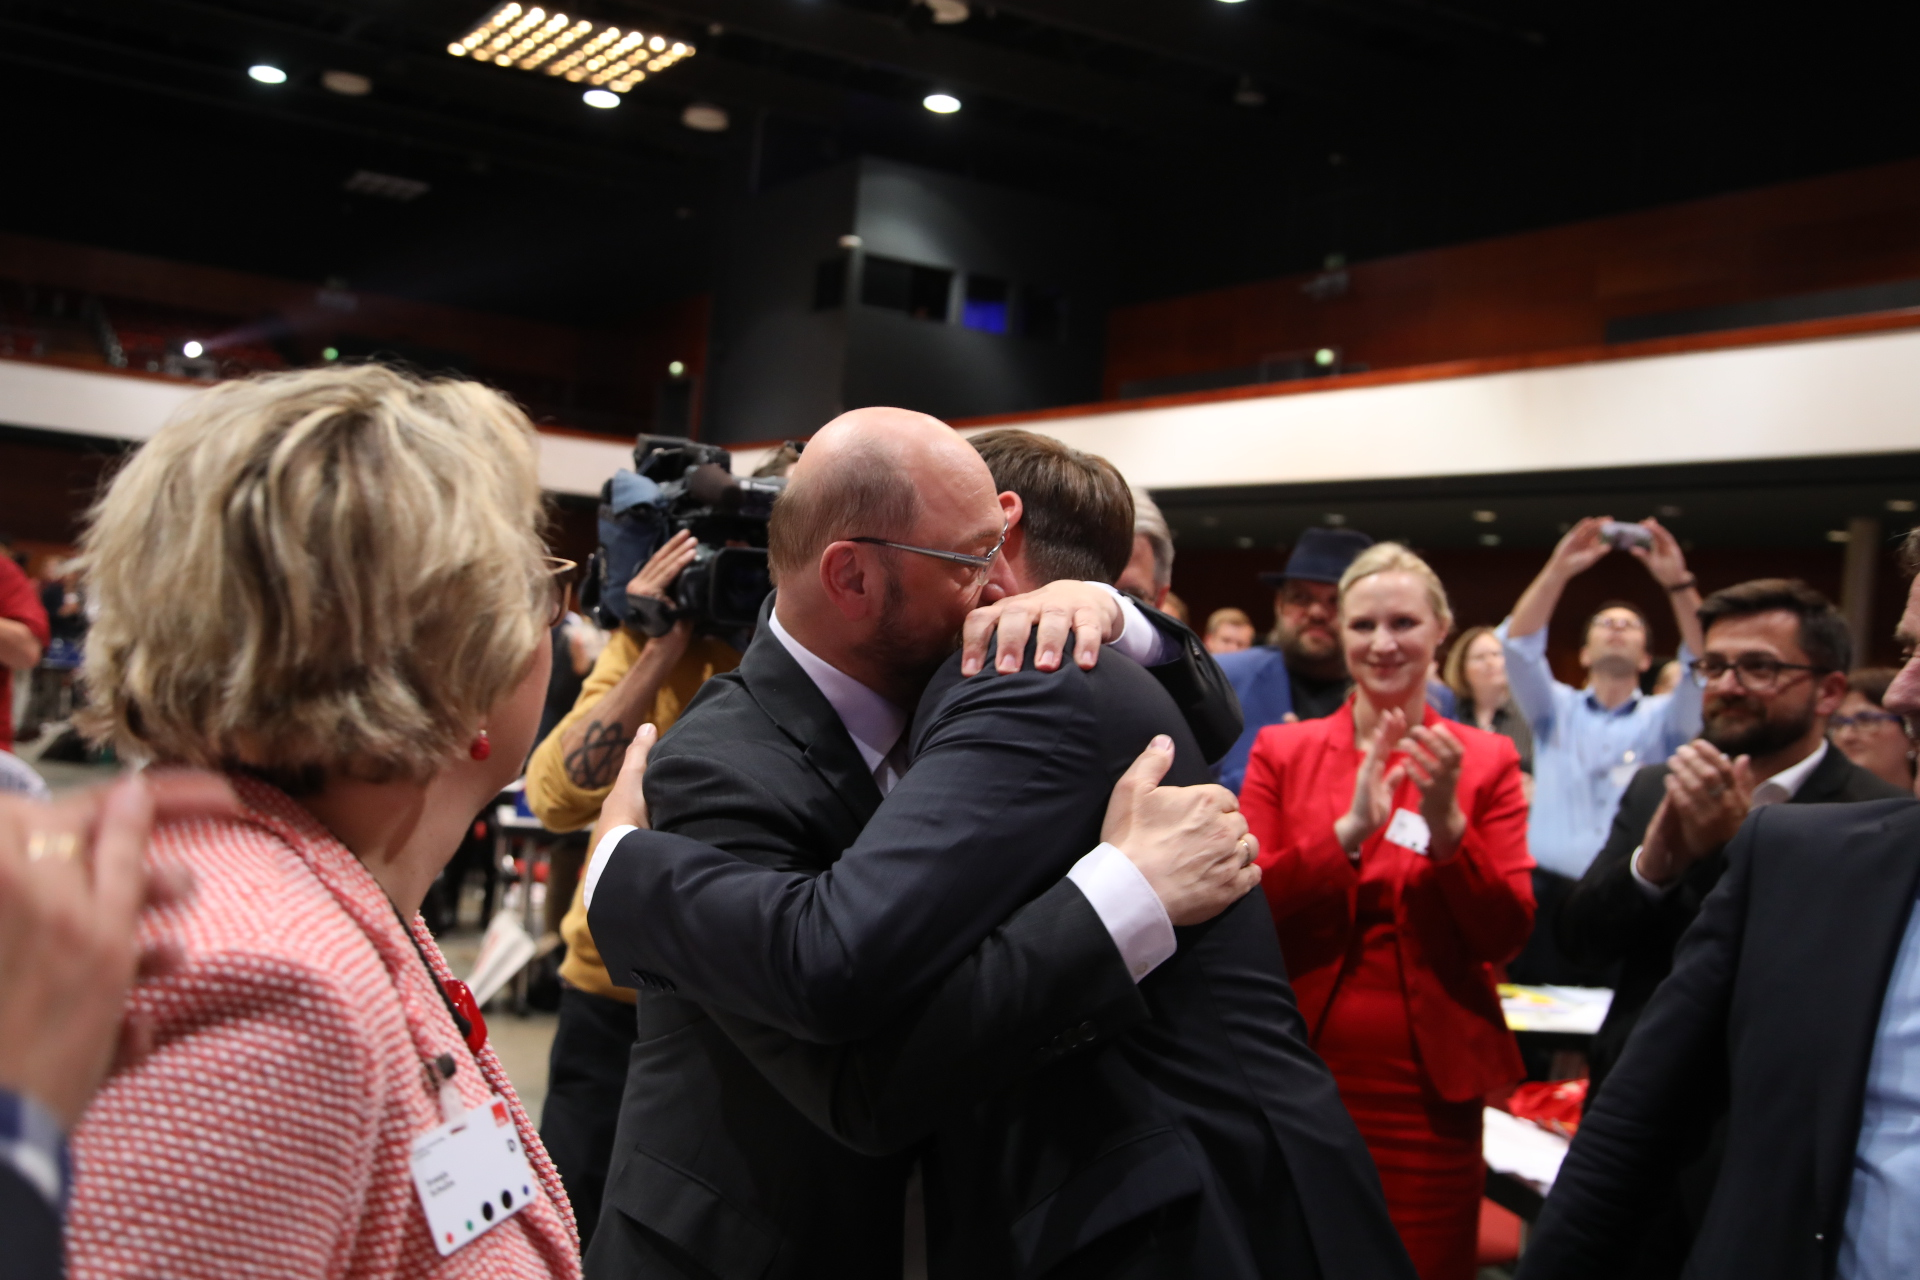 Martin Schulz umarmt jemanden